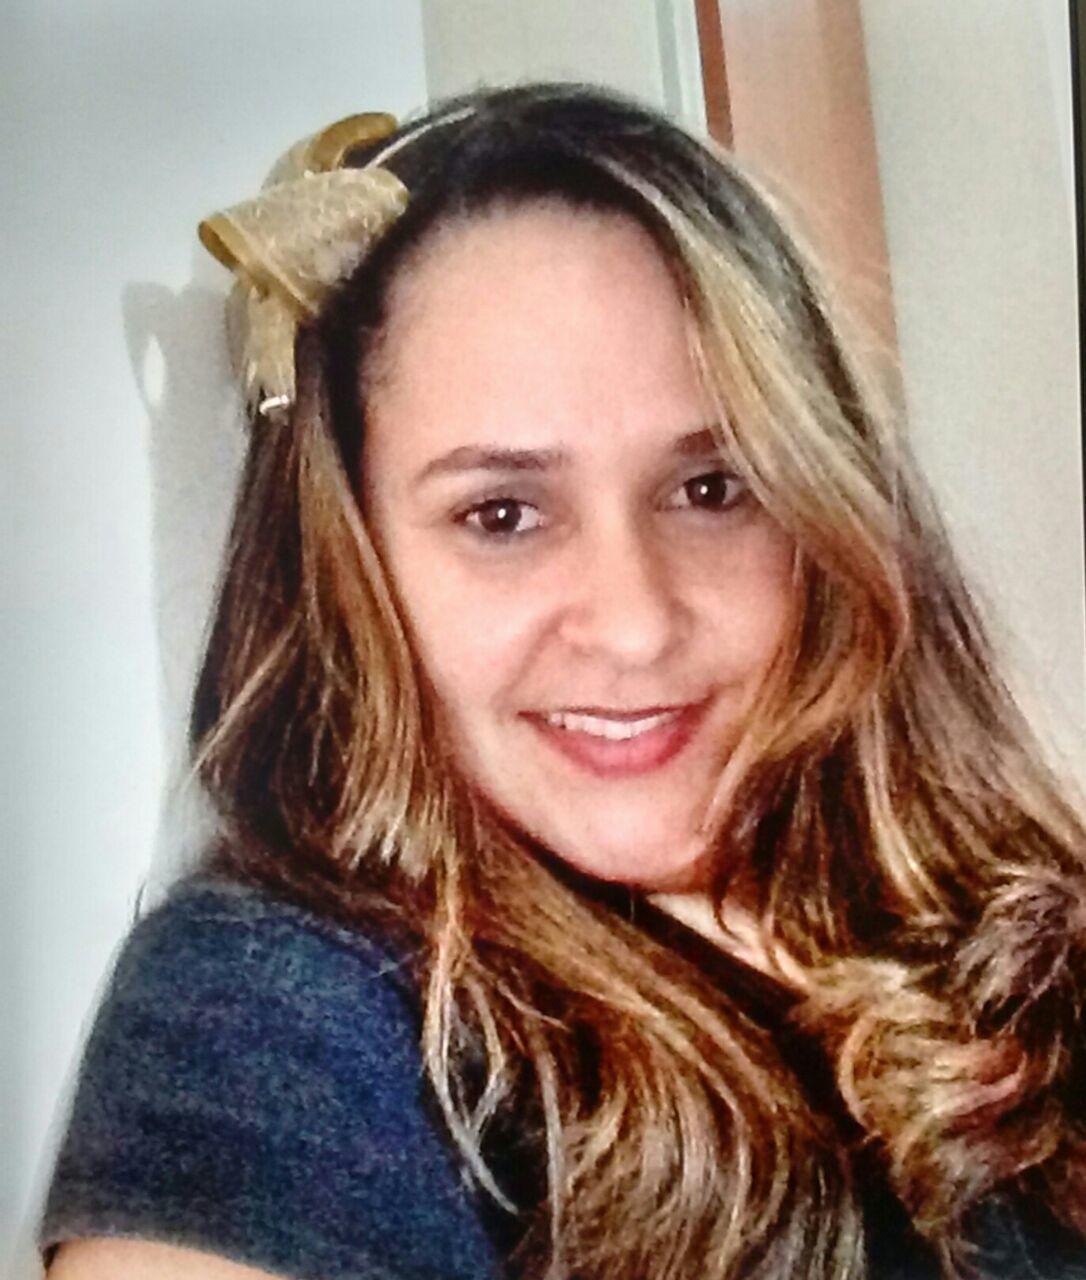 Dulciana Pacheco